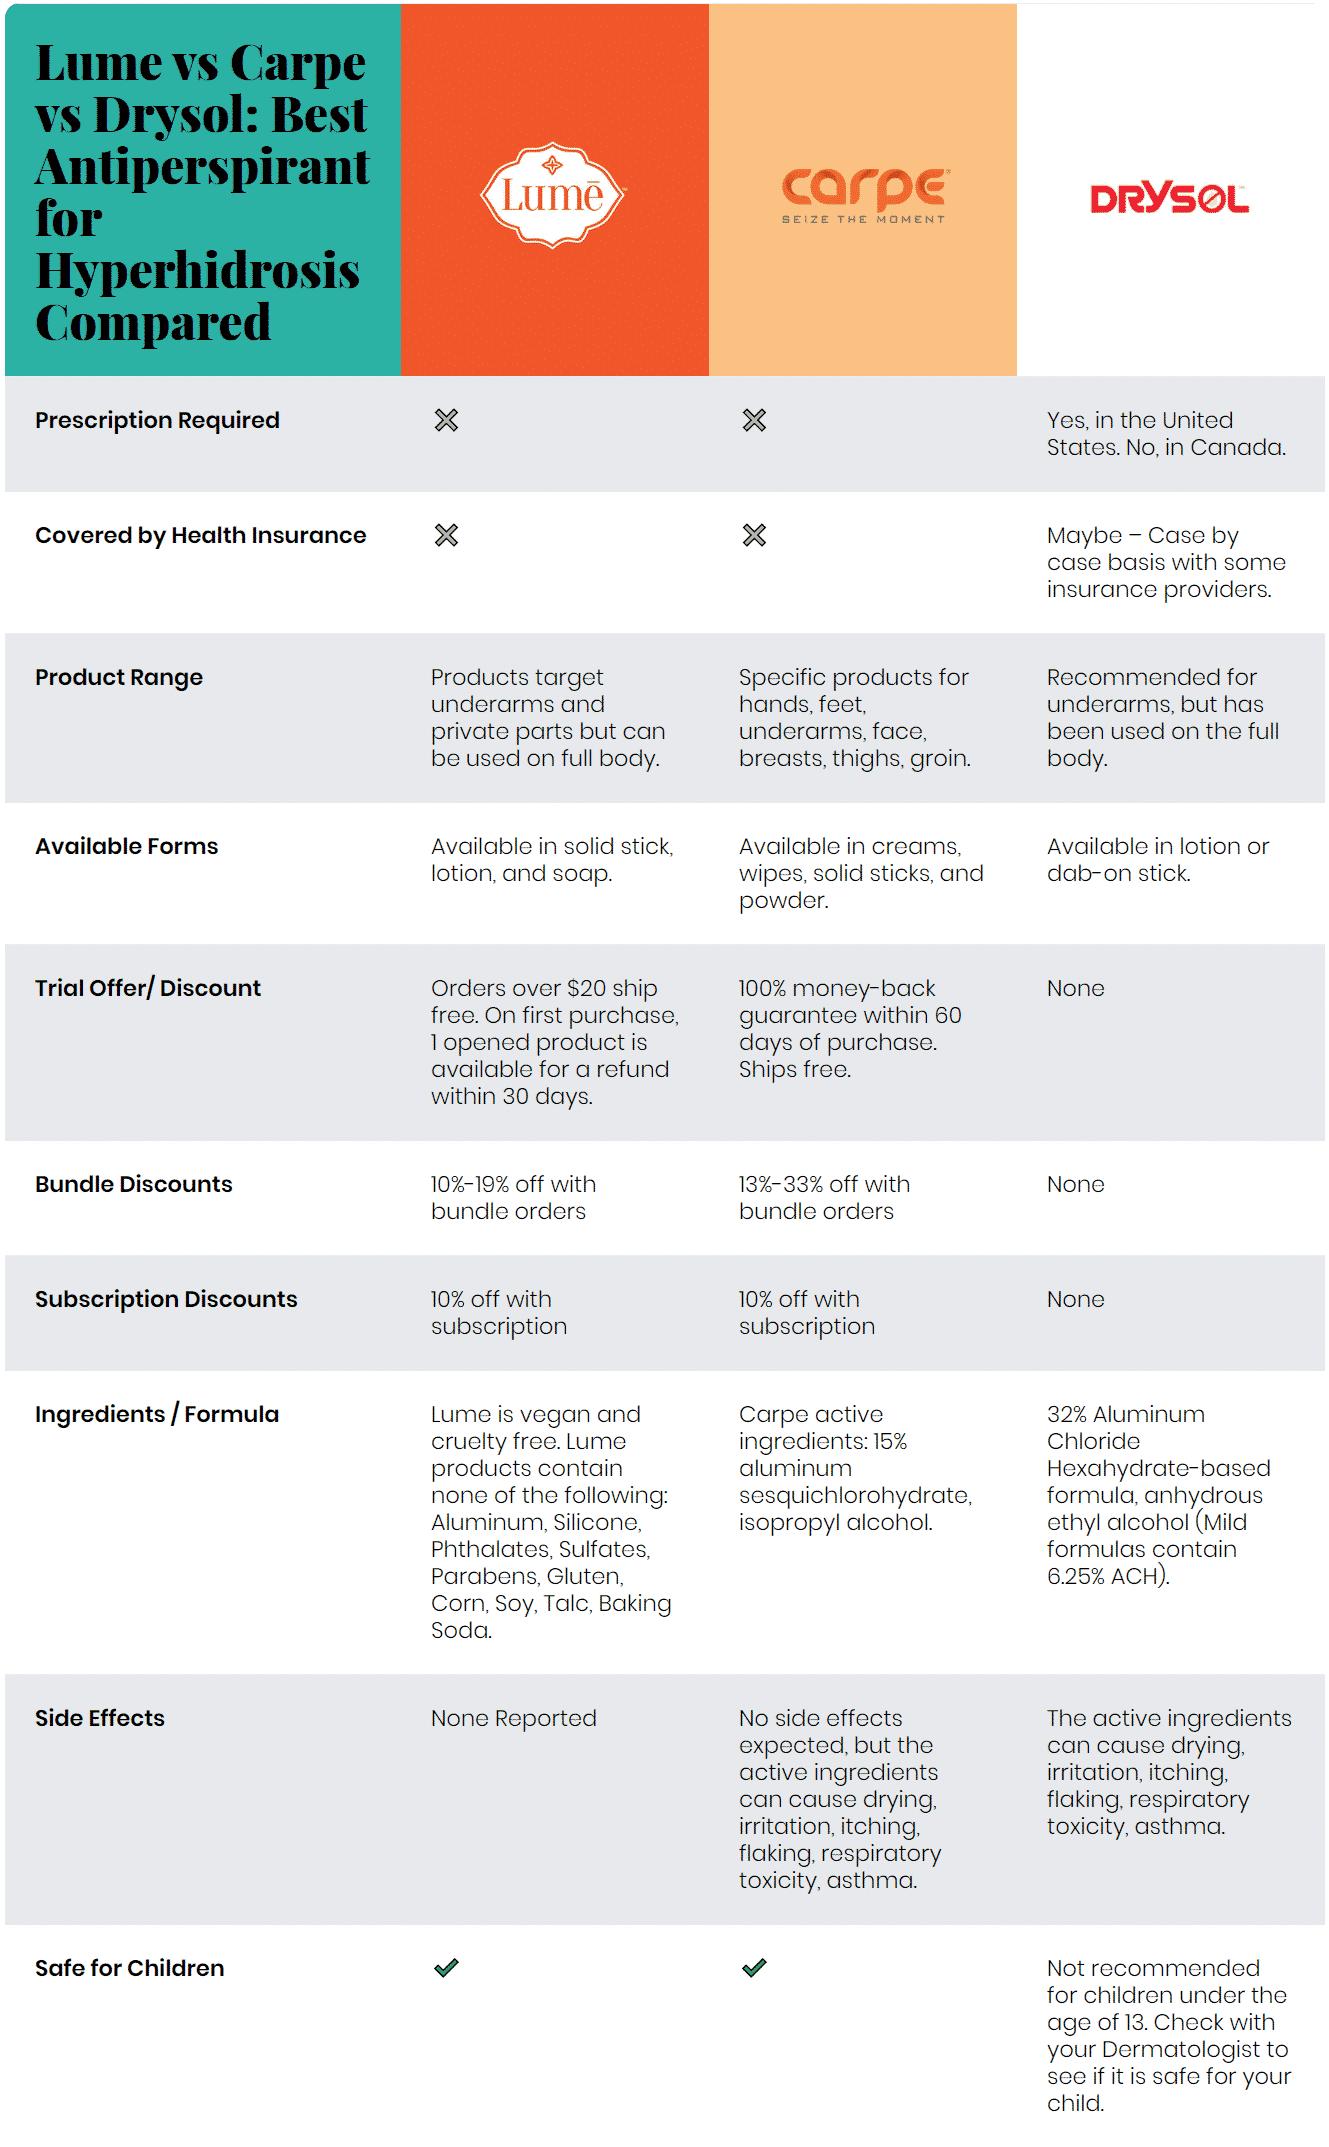 Lume vs Carpe vs Drysol: Antiperspirants For Hyperhidrosis Comparison